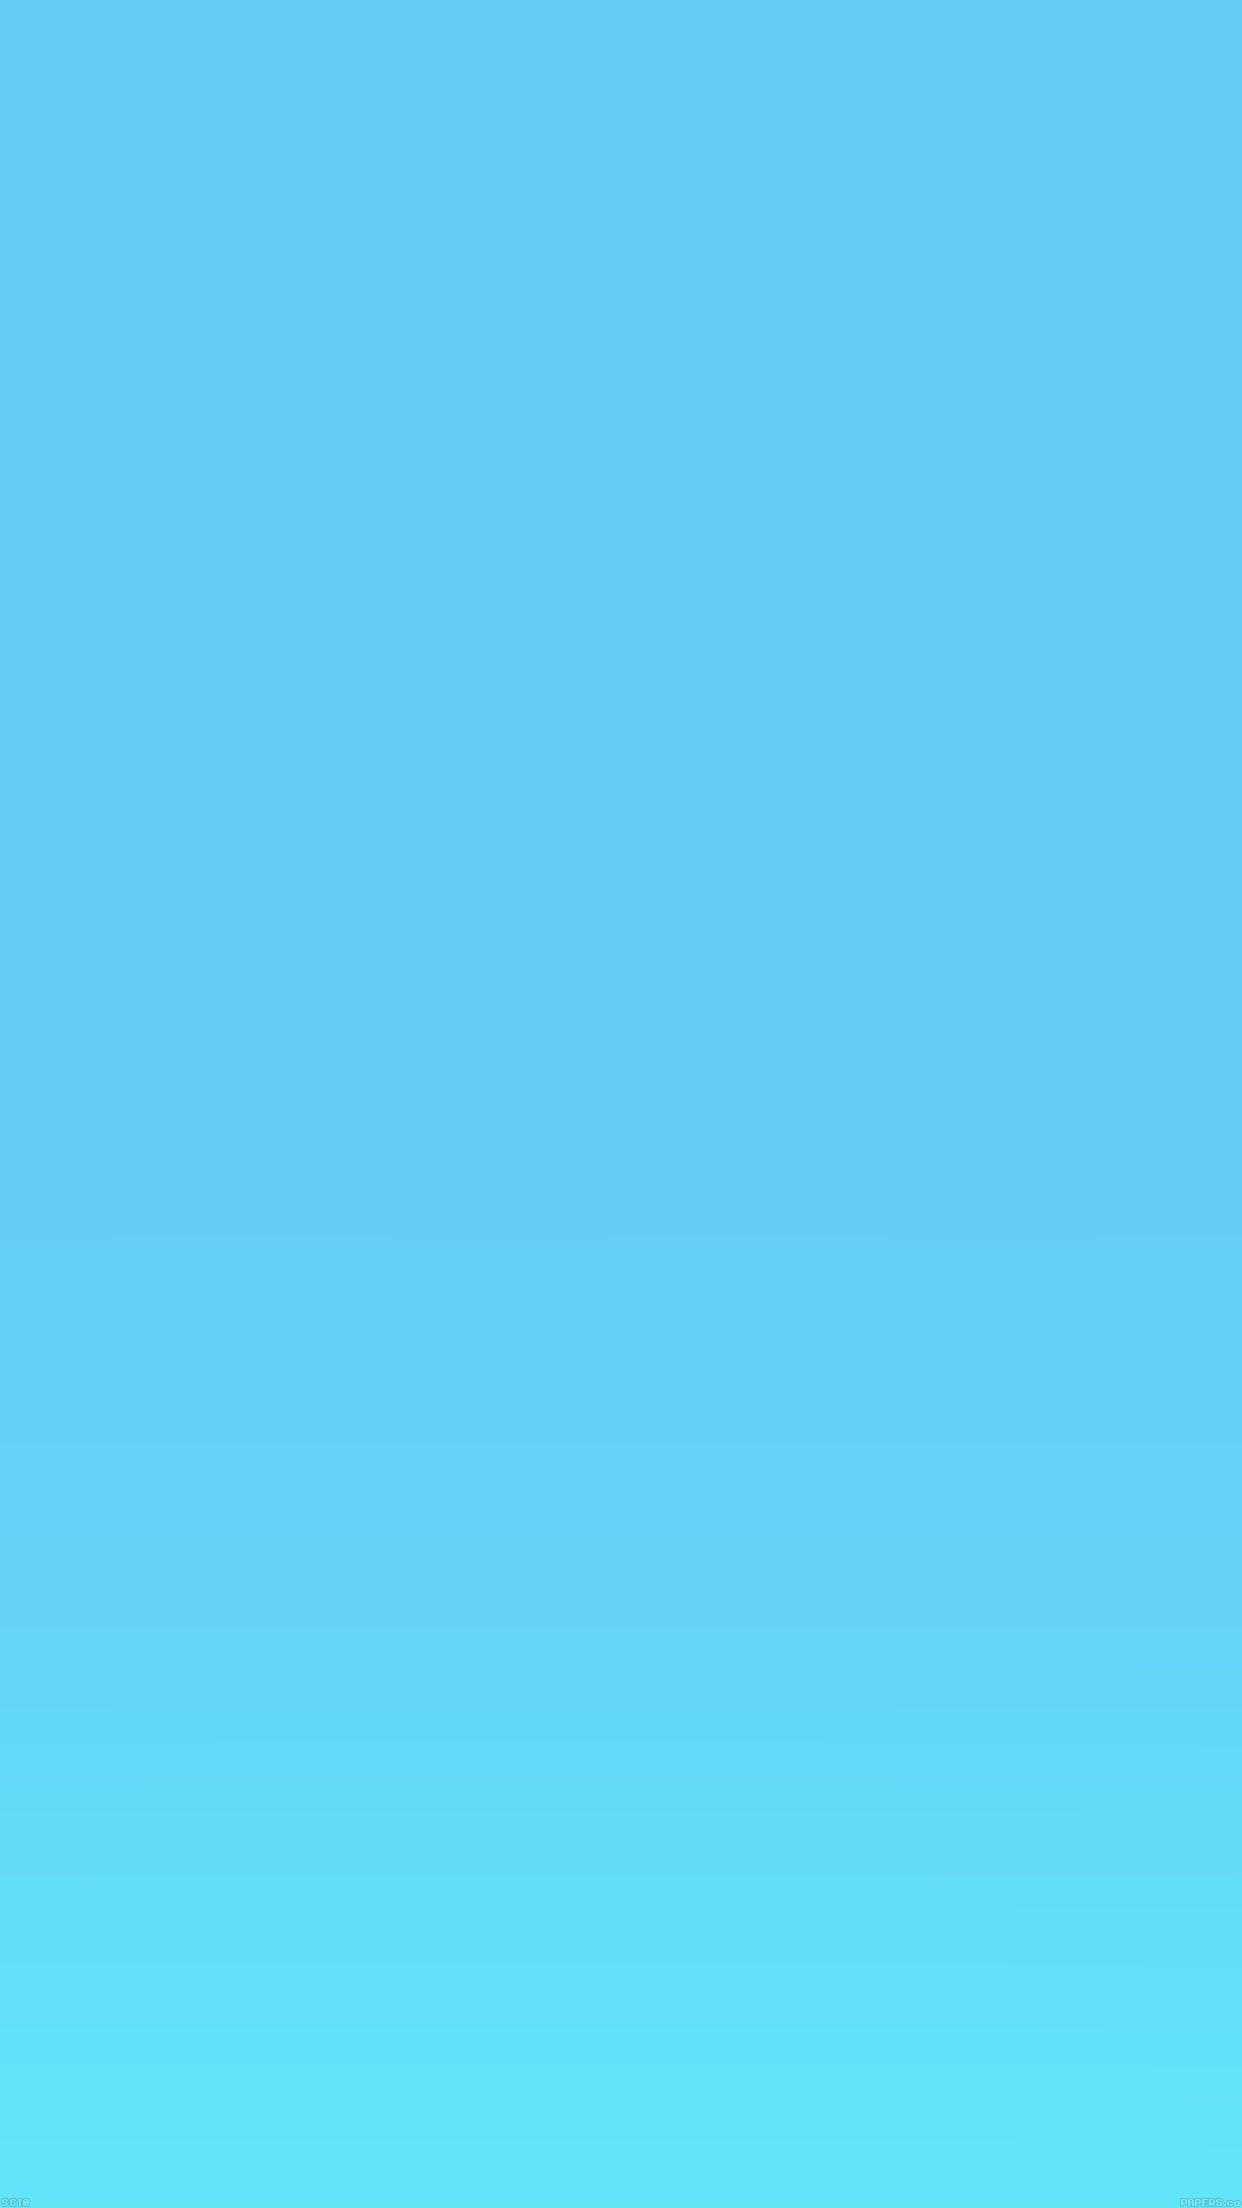 Light Blue Iphone 5 Wallpaper Punkie